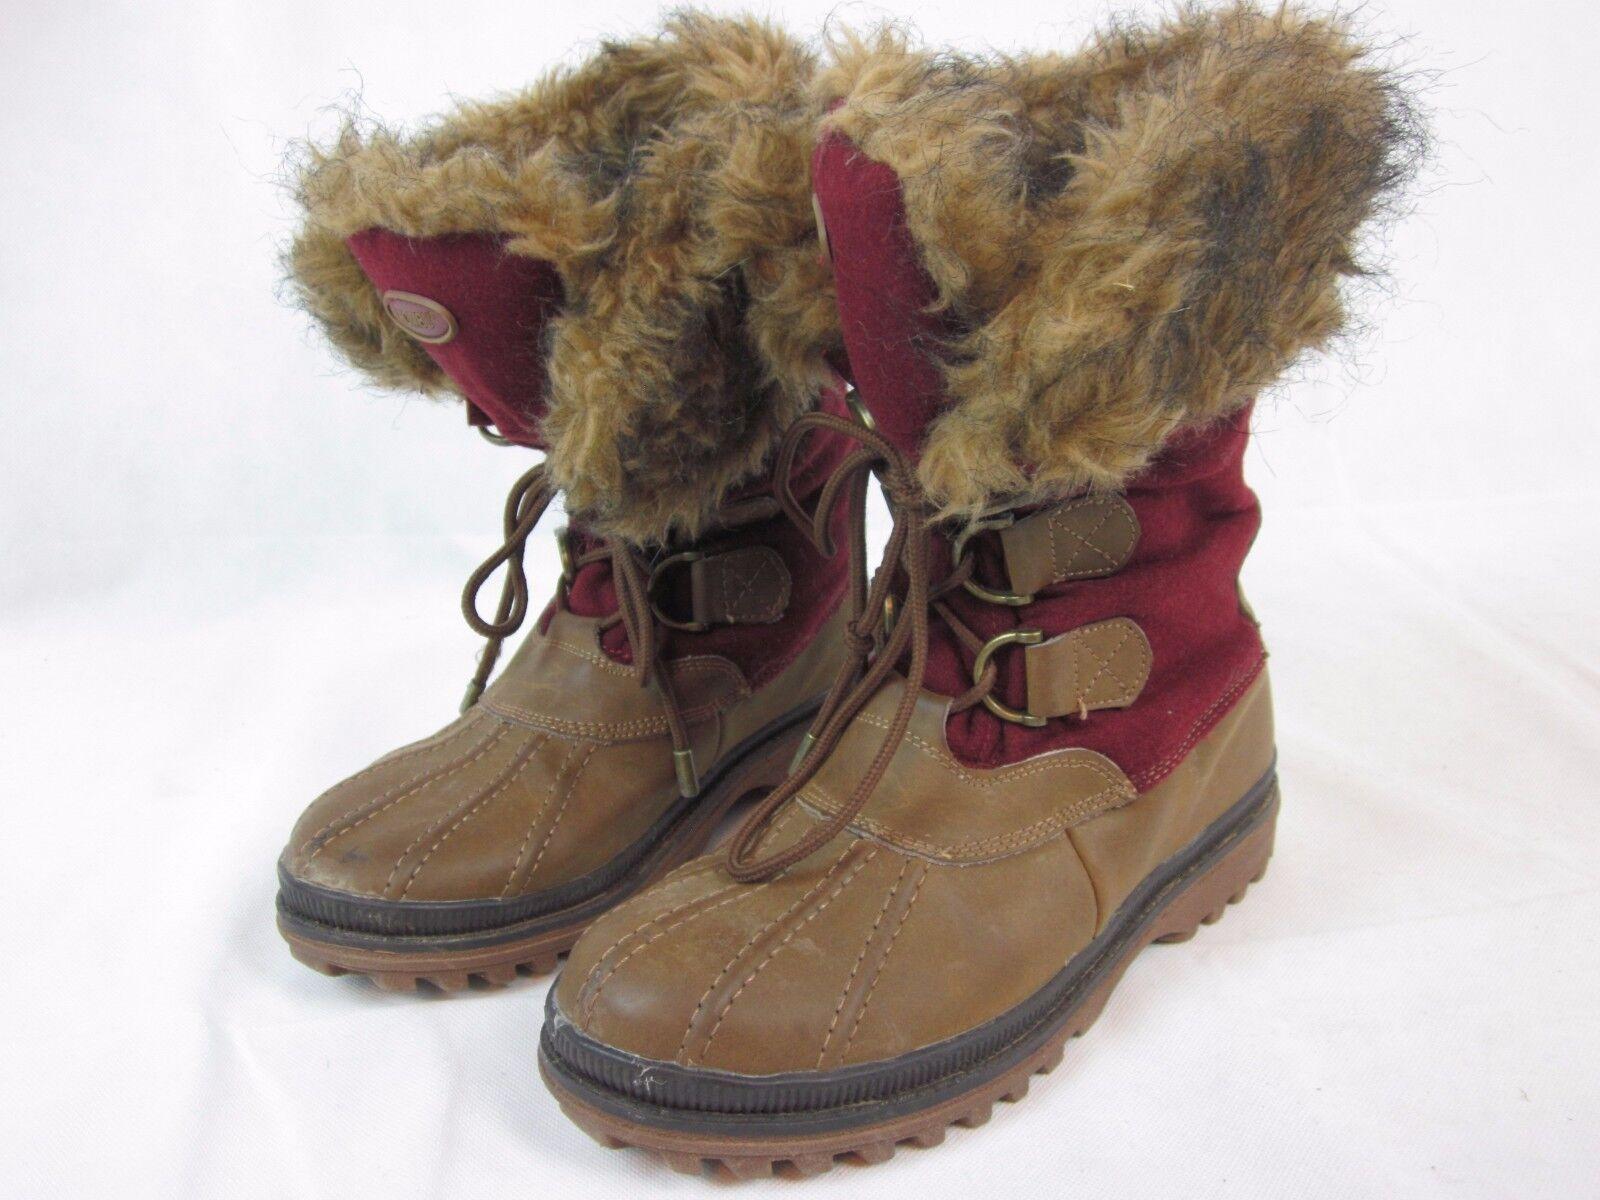 Khombu Park City Red Tan Leather & Faux Fur Lace Up Winter Boot Size 8